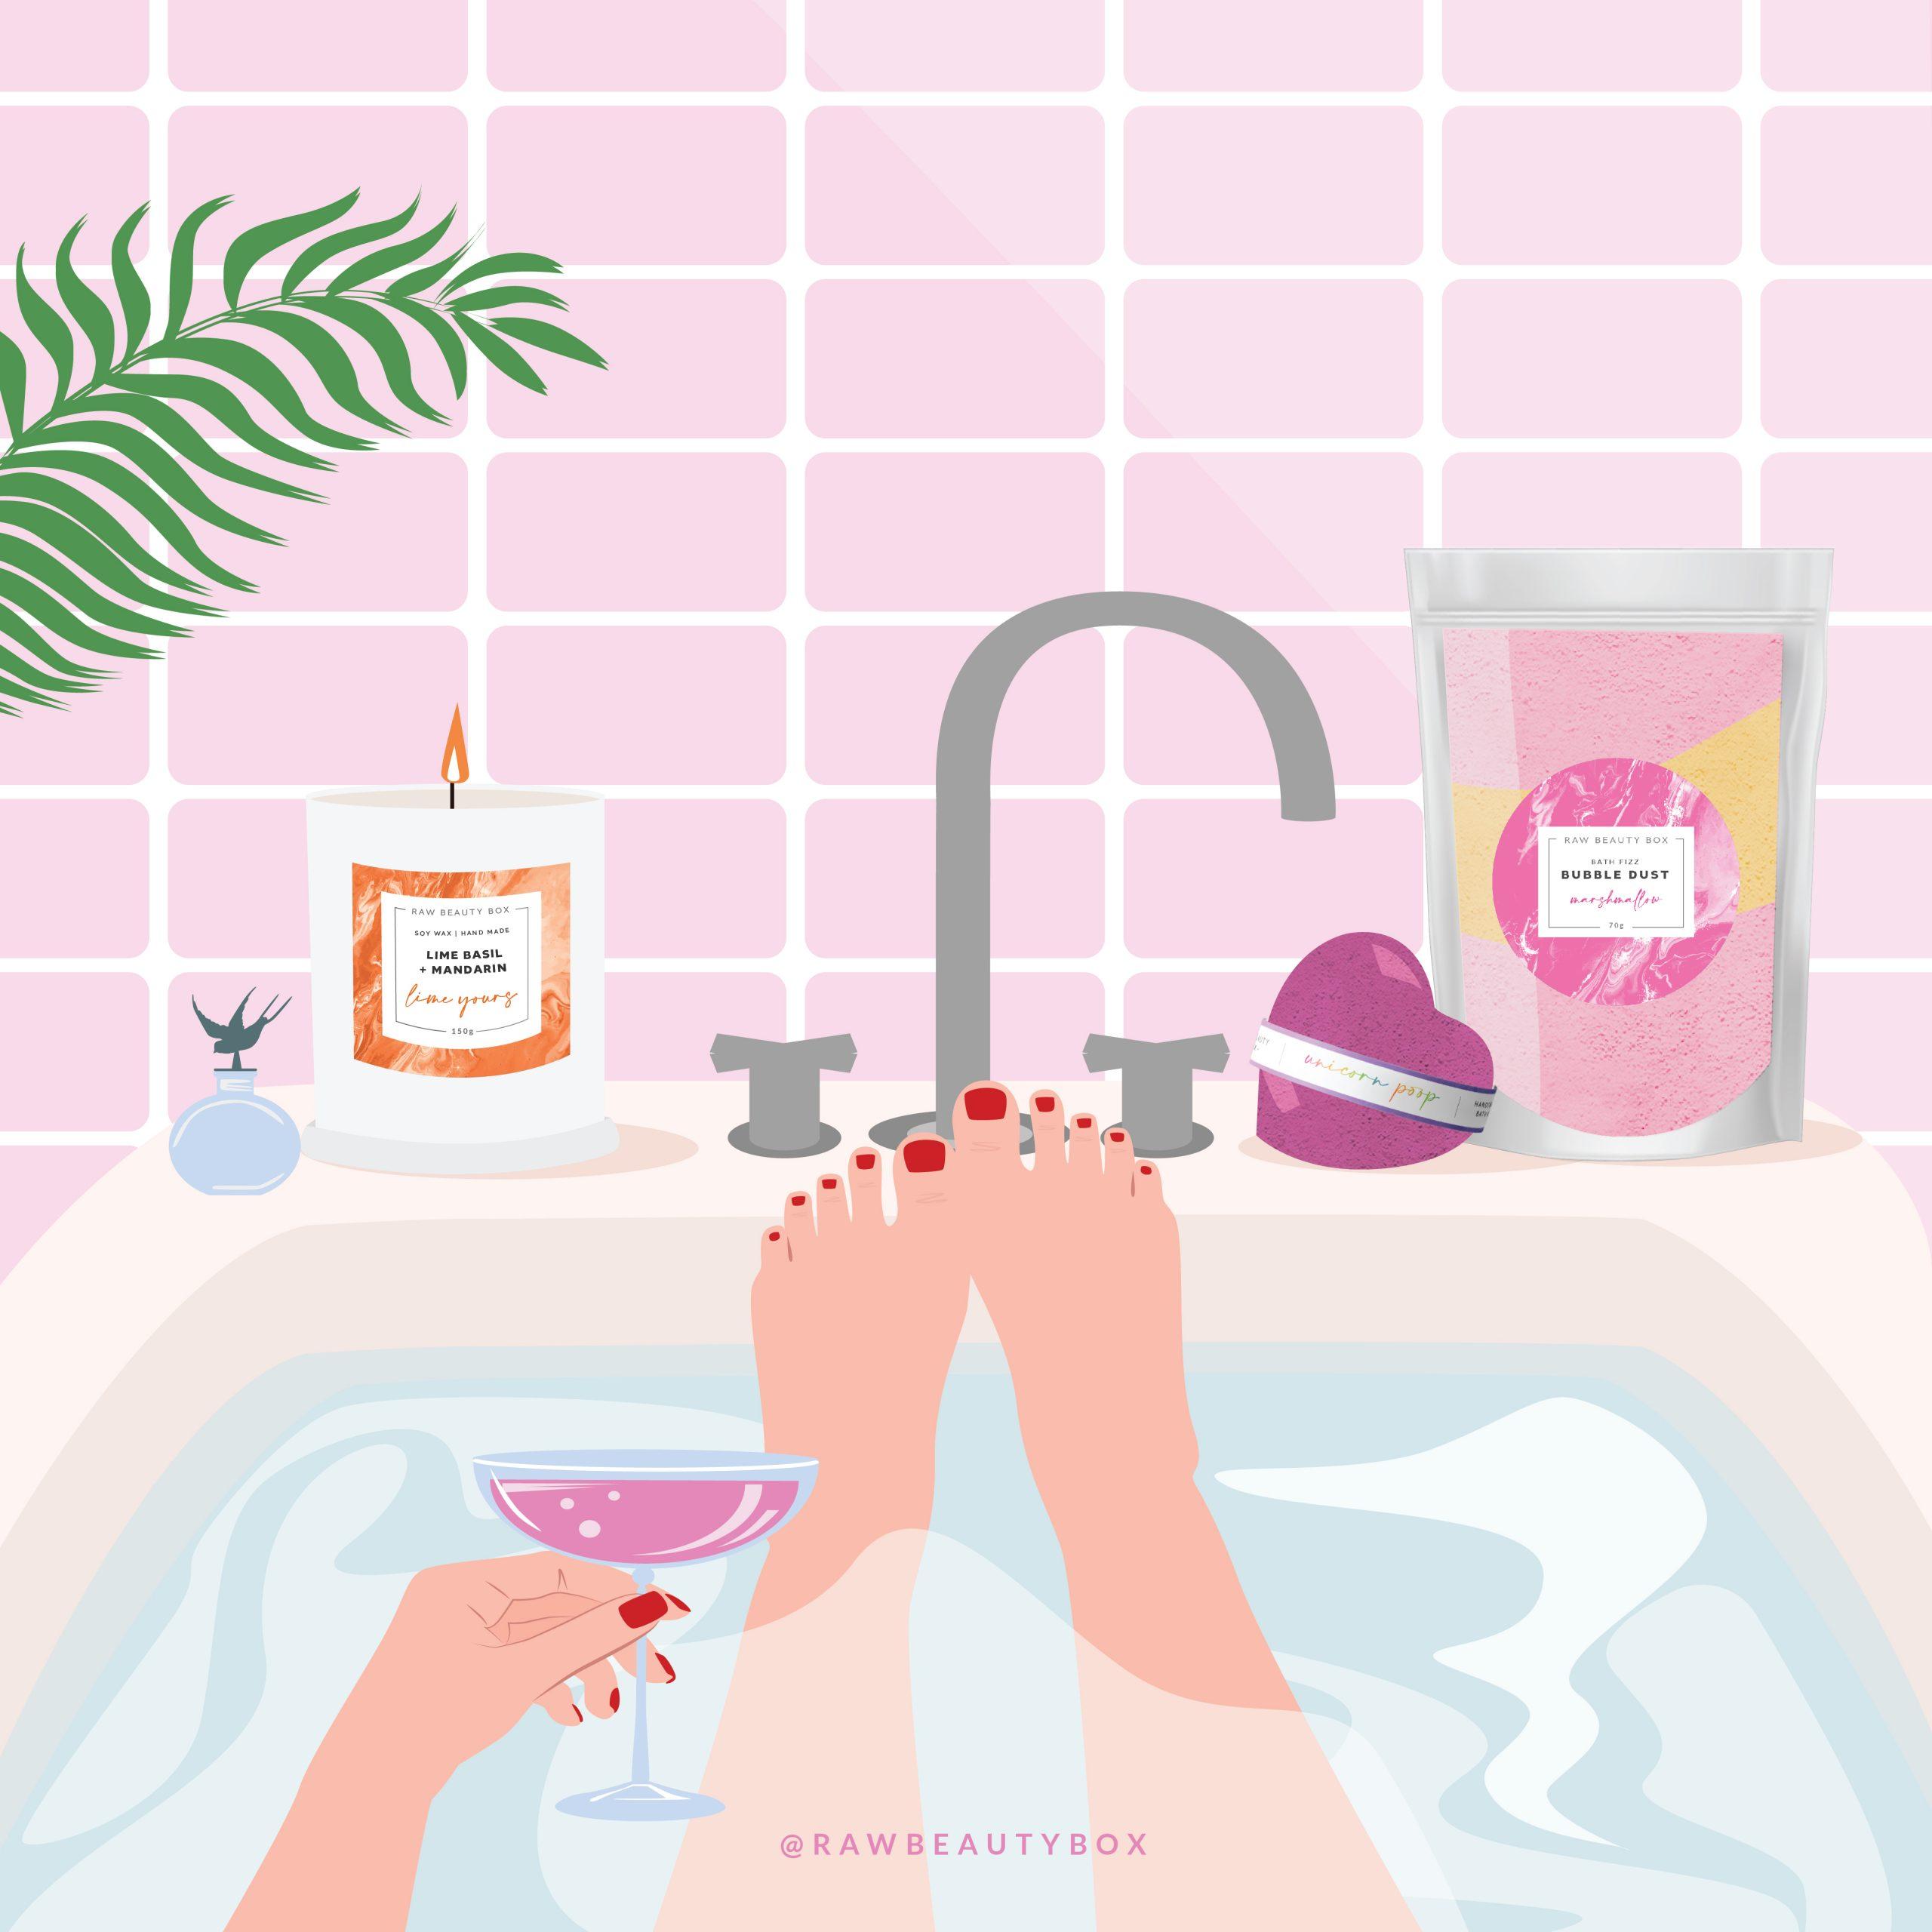 Self-Care Bath Illustration_Instagram Post